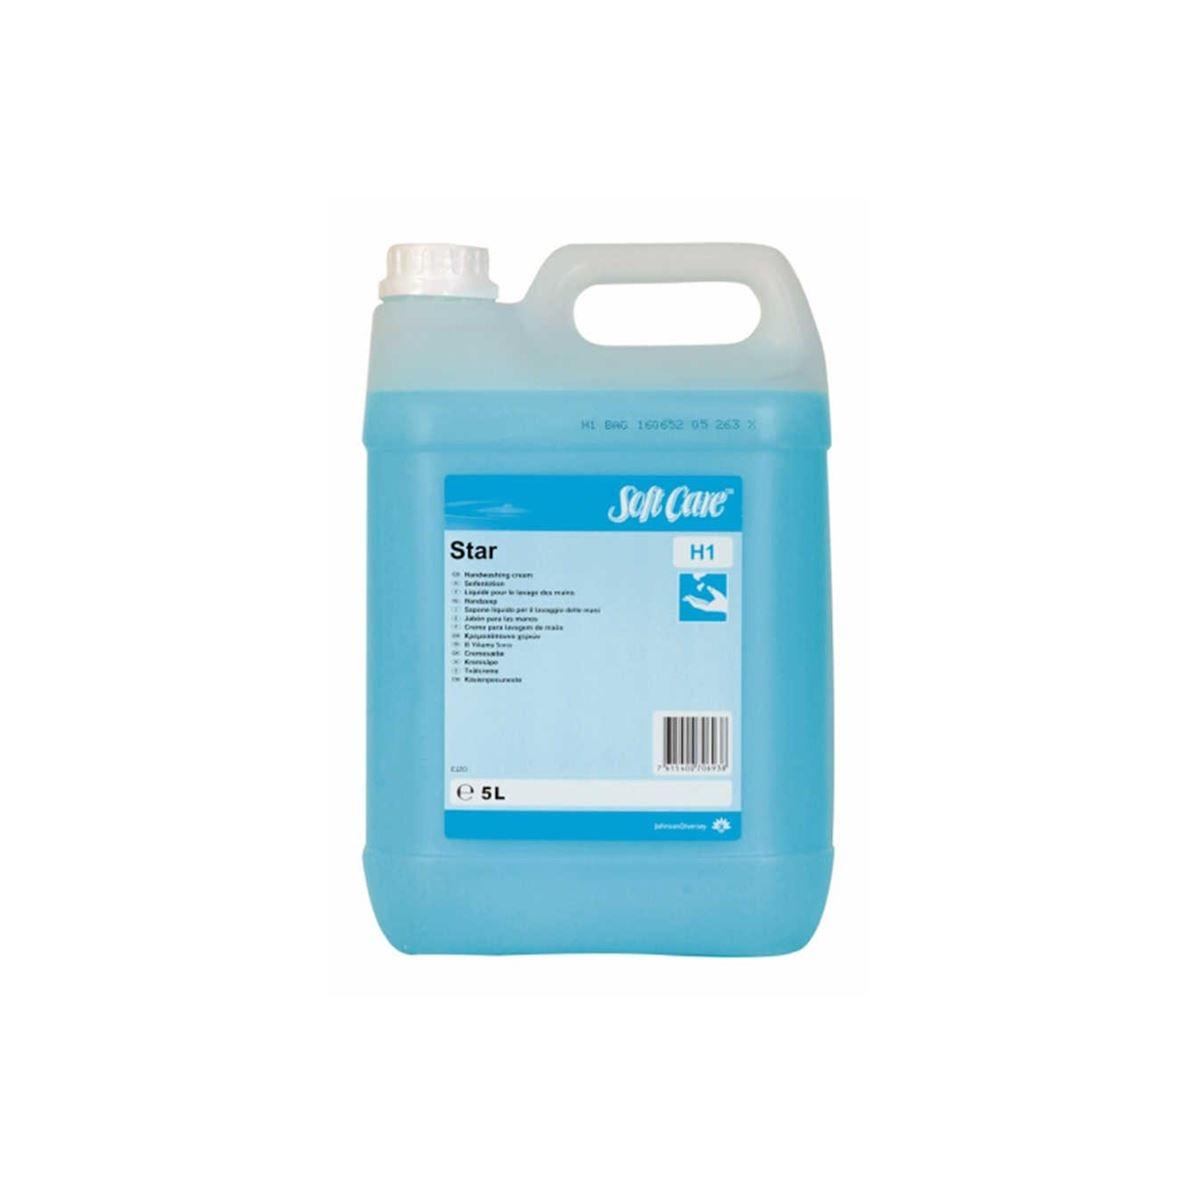 Diversey Orion Soft Care Star H100 Parfümlü El Yıkama Sıvısı 5,20kg(2'li koli) resmi